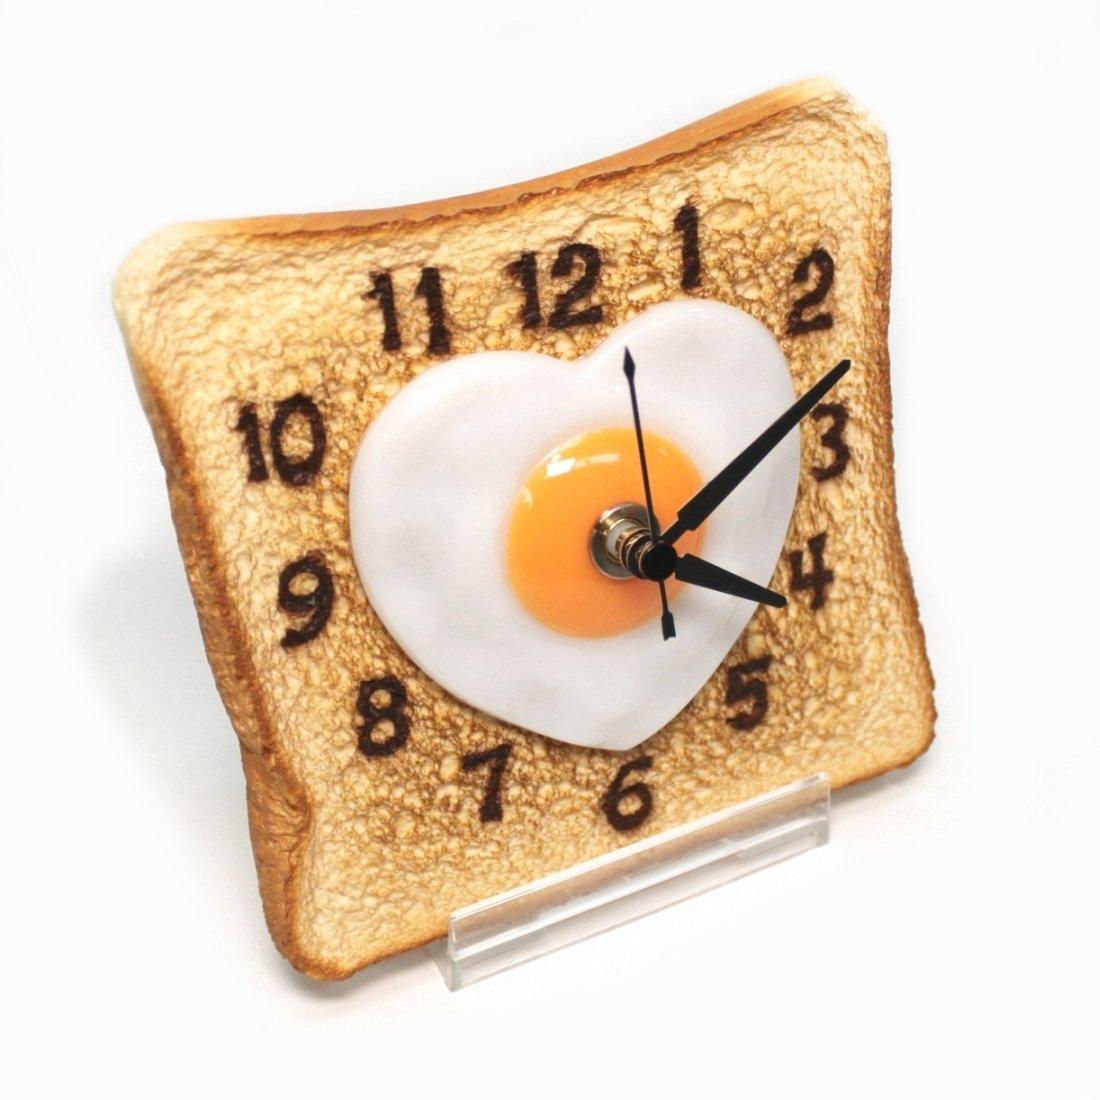 Real Gift ハートのエッグパン時計 SN04-3035 食品サンプル時計 アナログ 置時計 B01NAX8WGJ